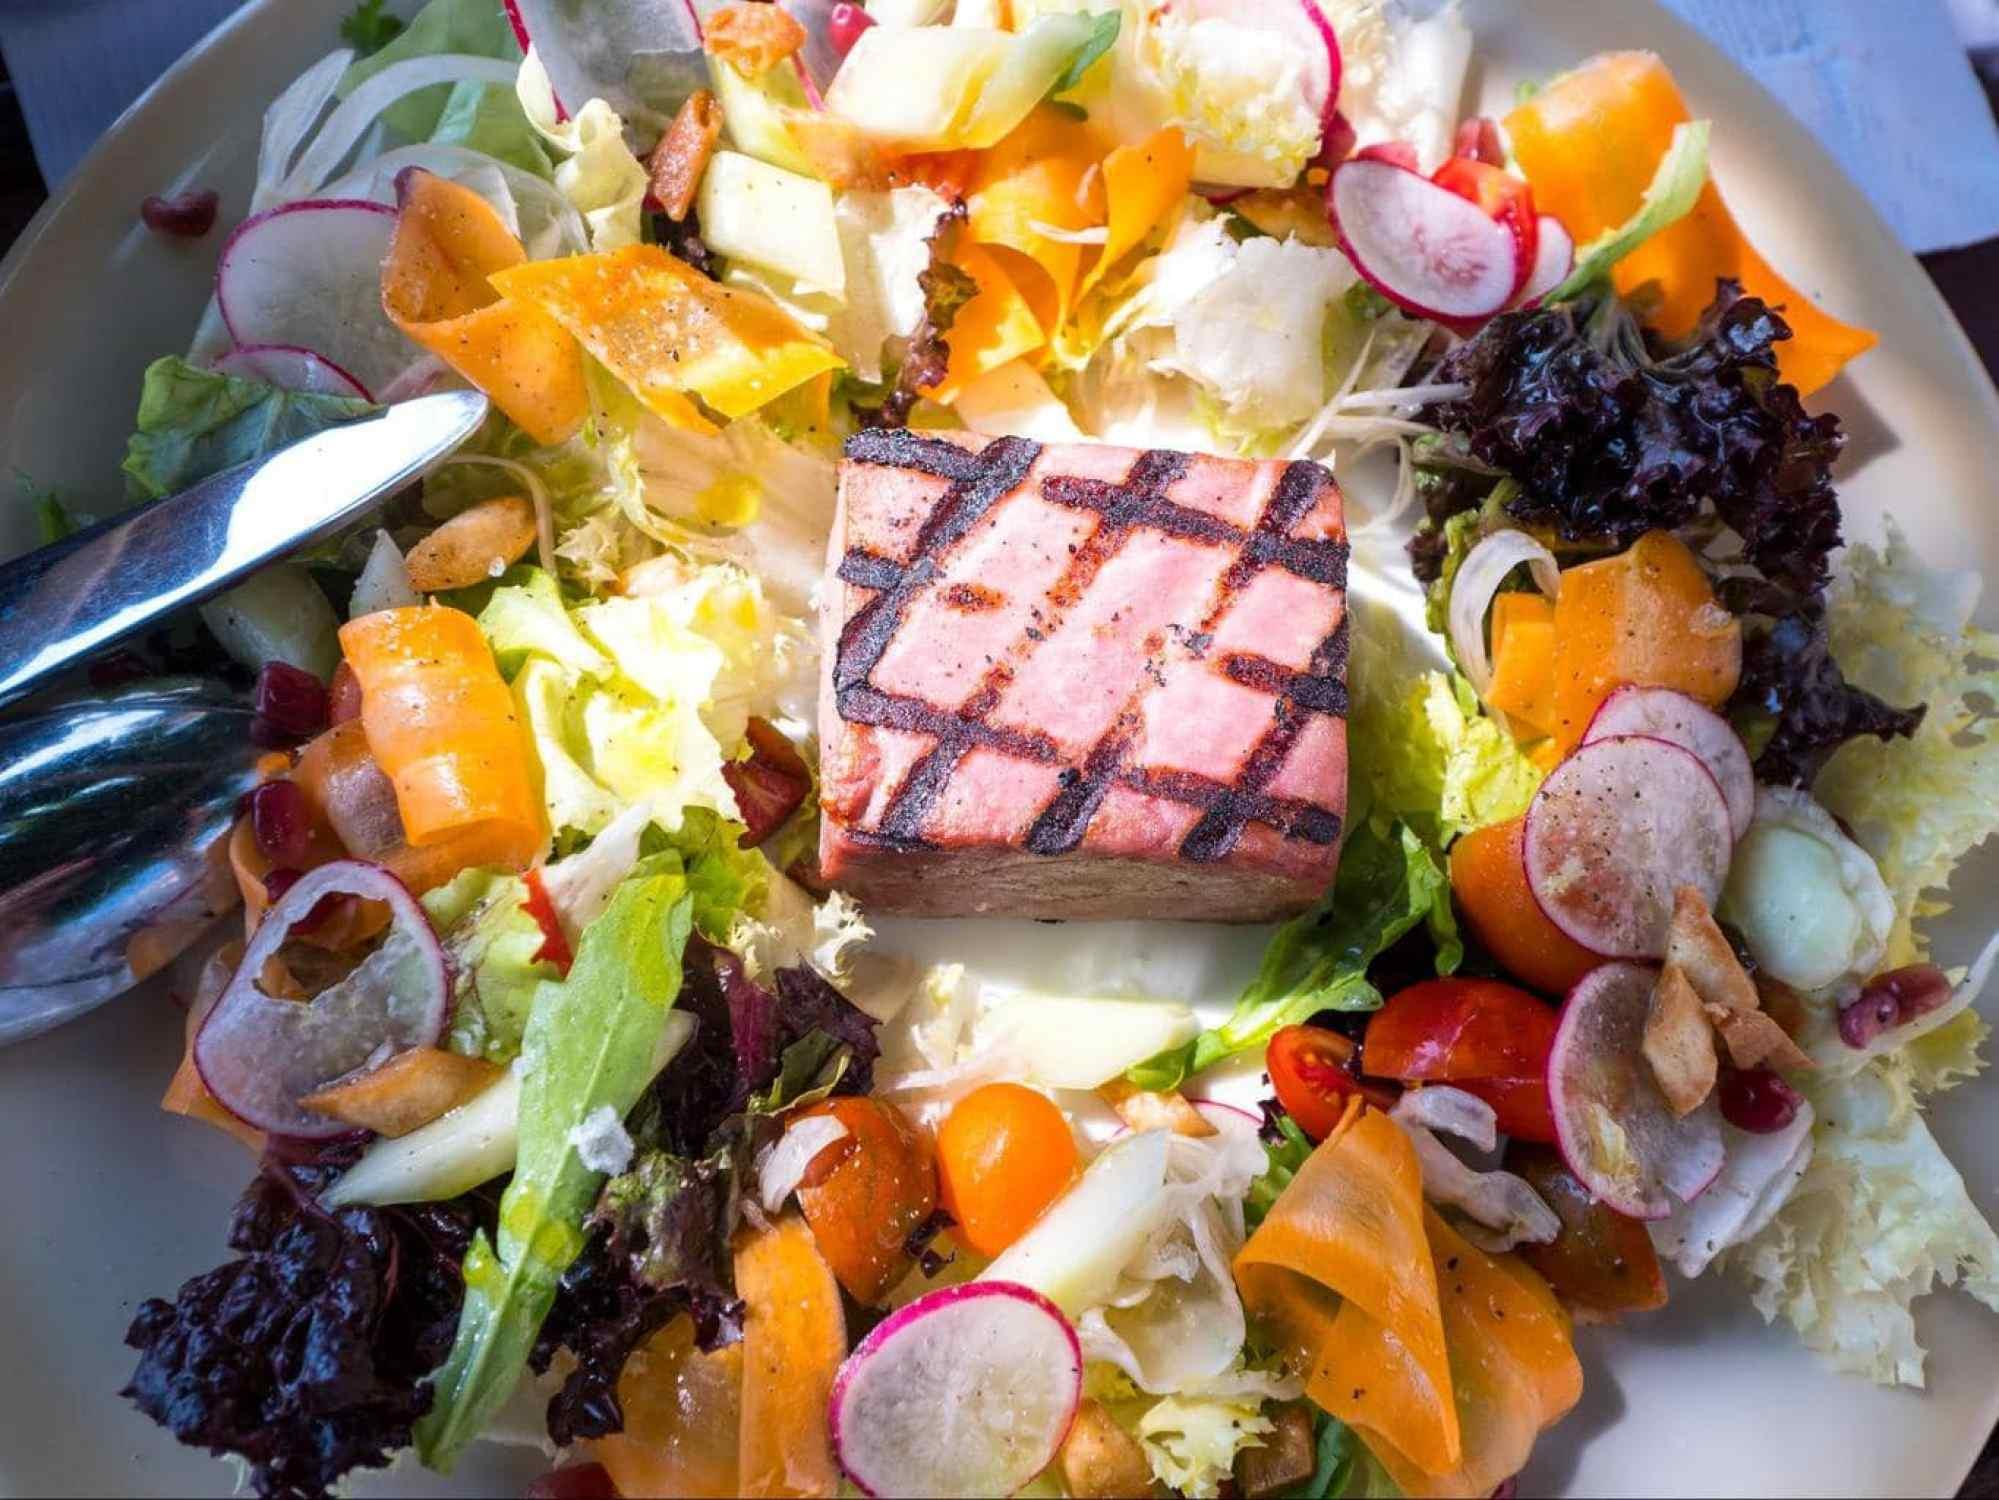 Salads at Loggia 02